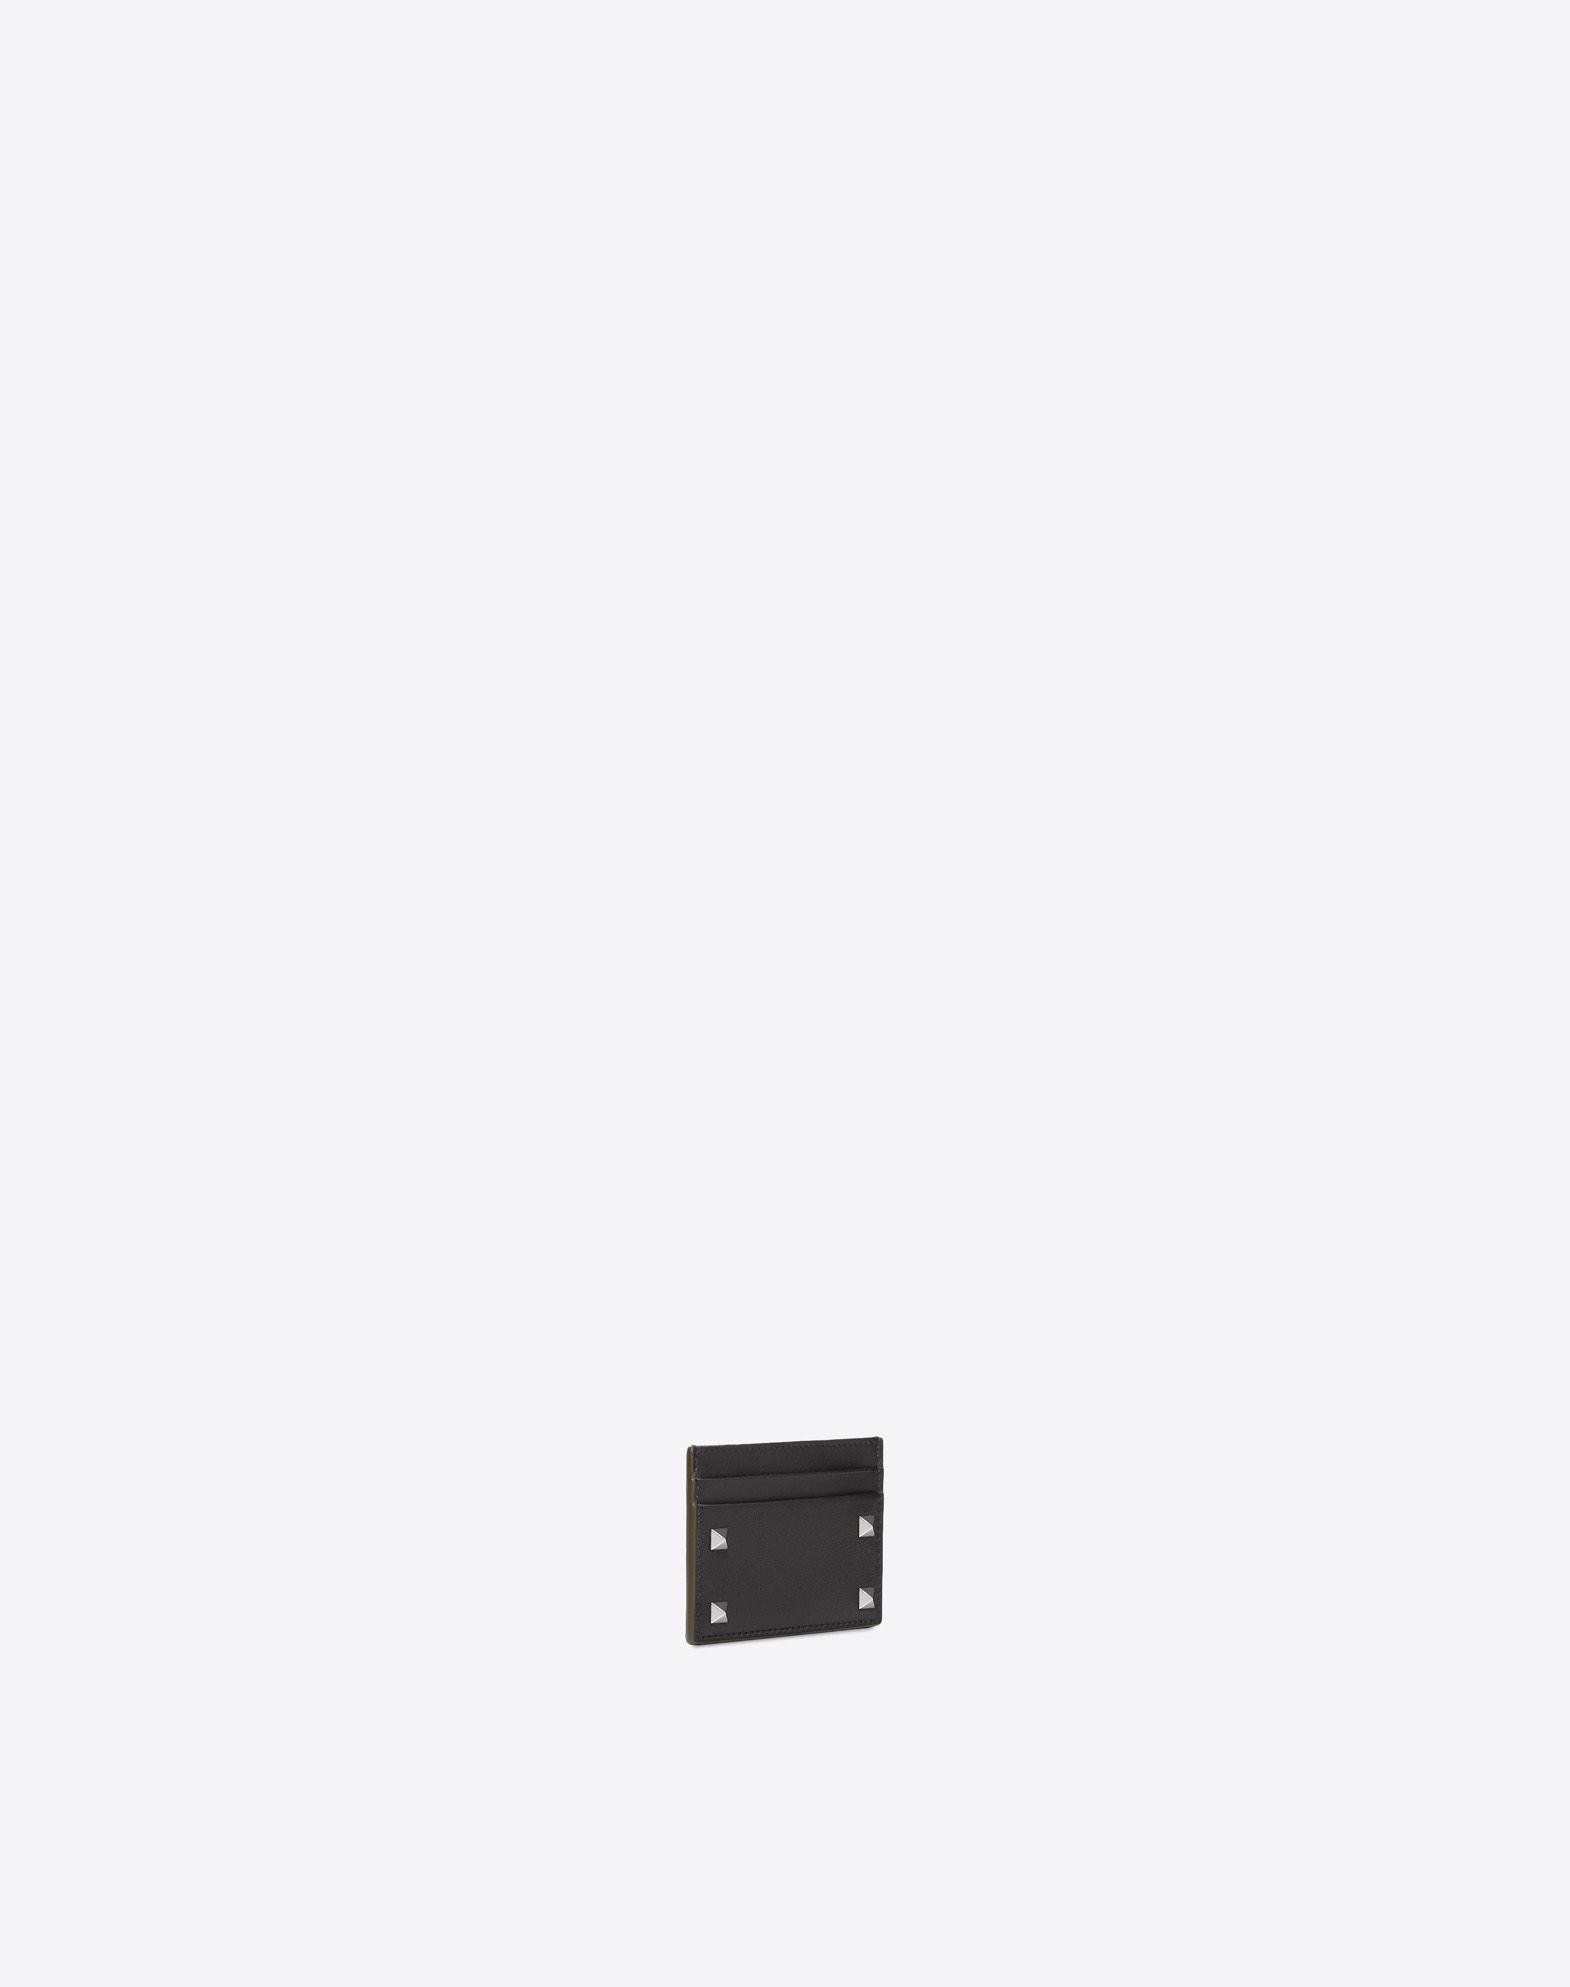 VALENTINO GARAVANI UOMO Rockstud Cardholder COIN PURSES & CARD CASES U r